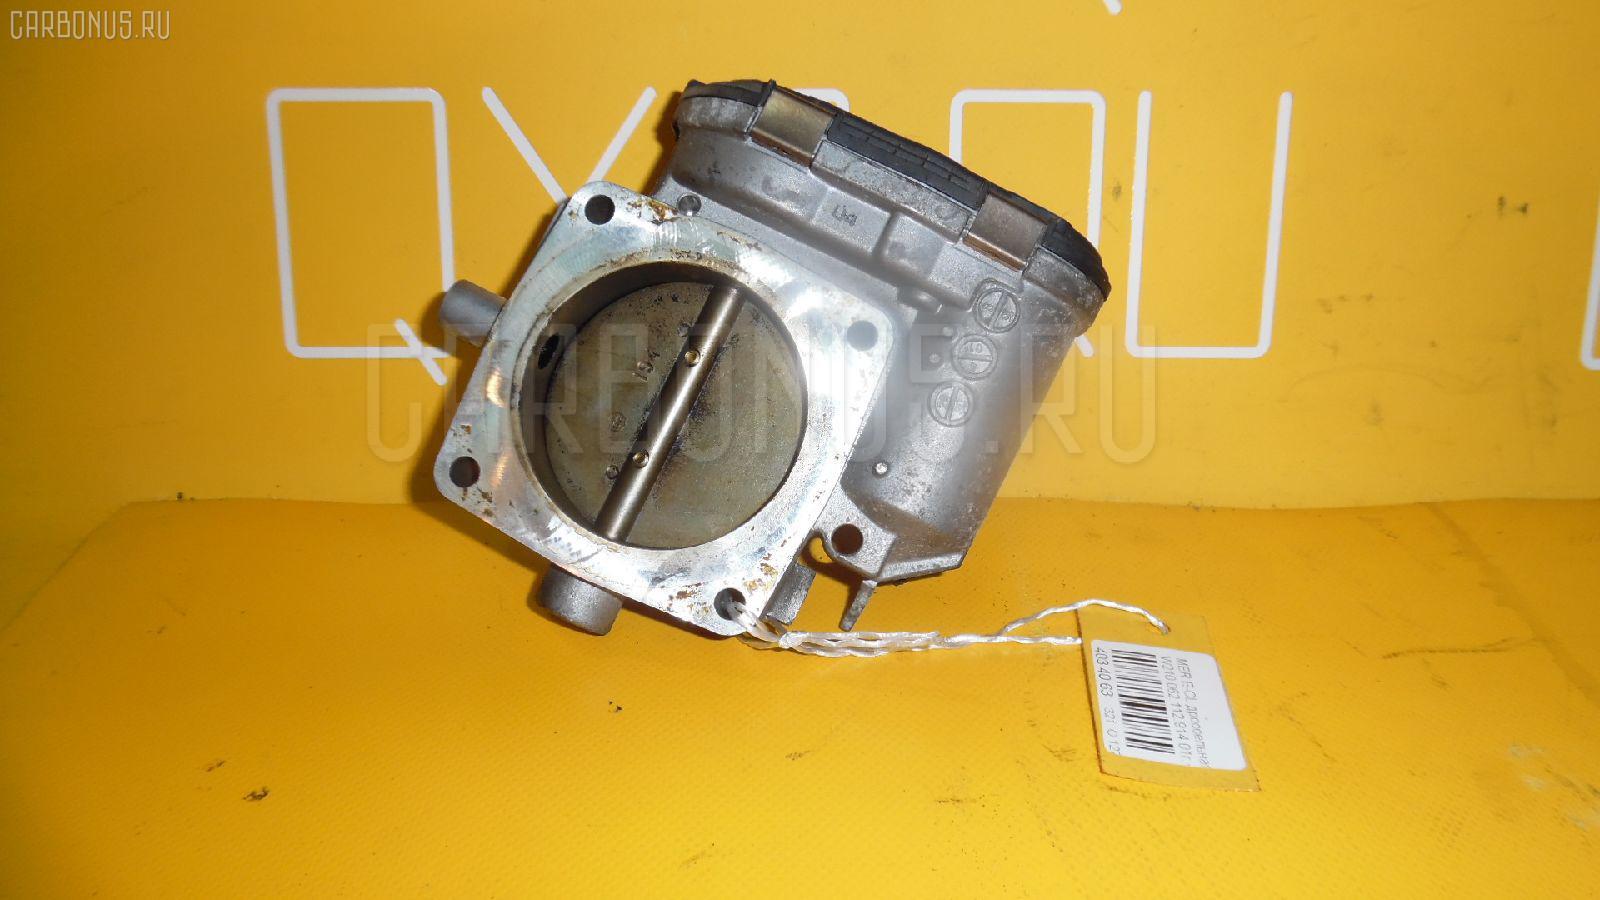 Дроссельная заслонка MERCEDES-BENZ E-CLASS W210.062 112.914. Фото 3